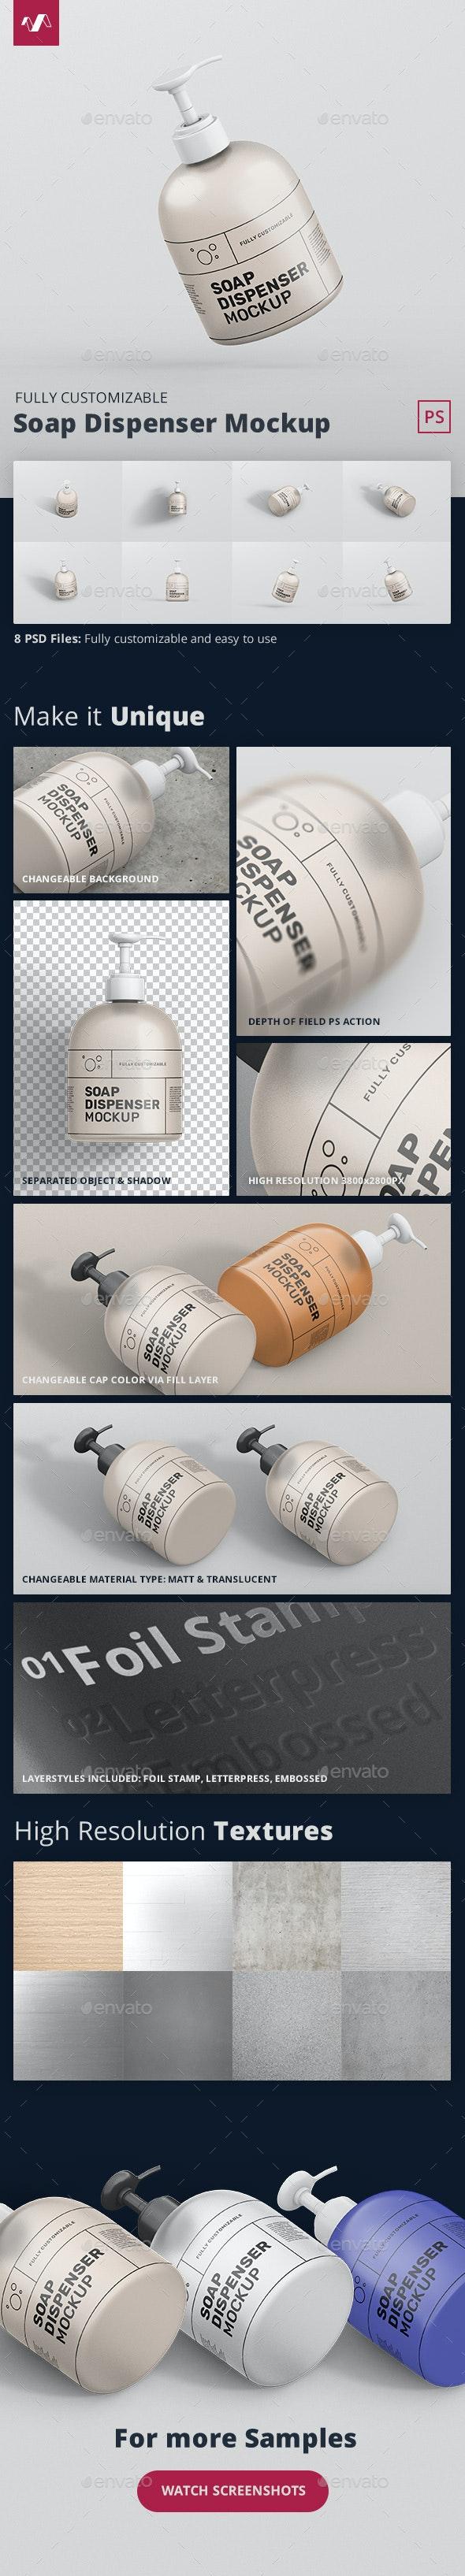 Soap Dispenser Mockup - Miscellaneous Packaging